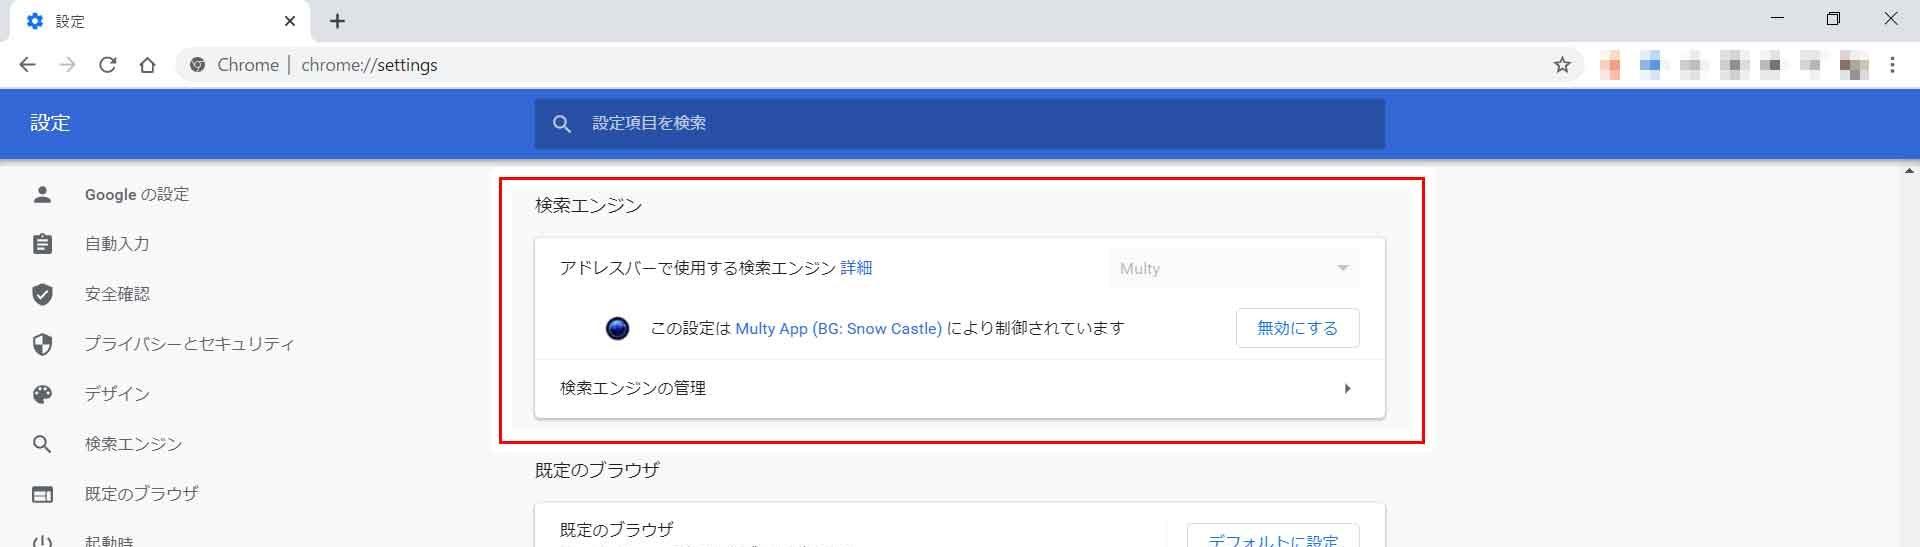 Google Chrome設定画面で「検索エンジン」欄を確認し、設定を変更する